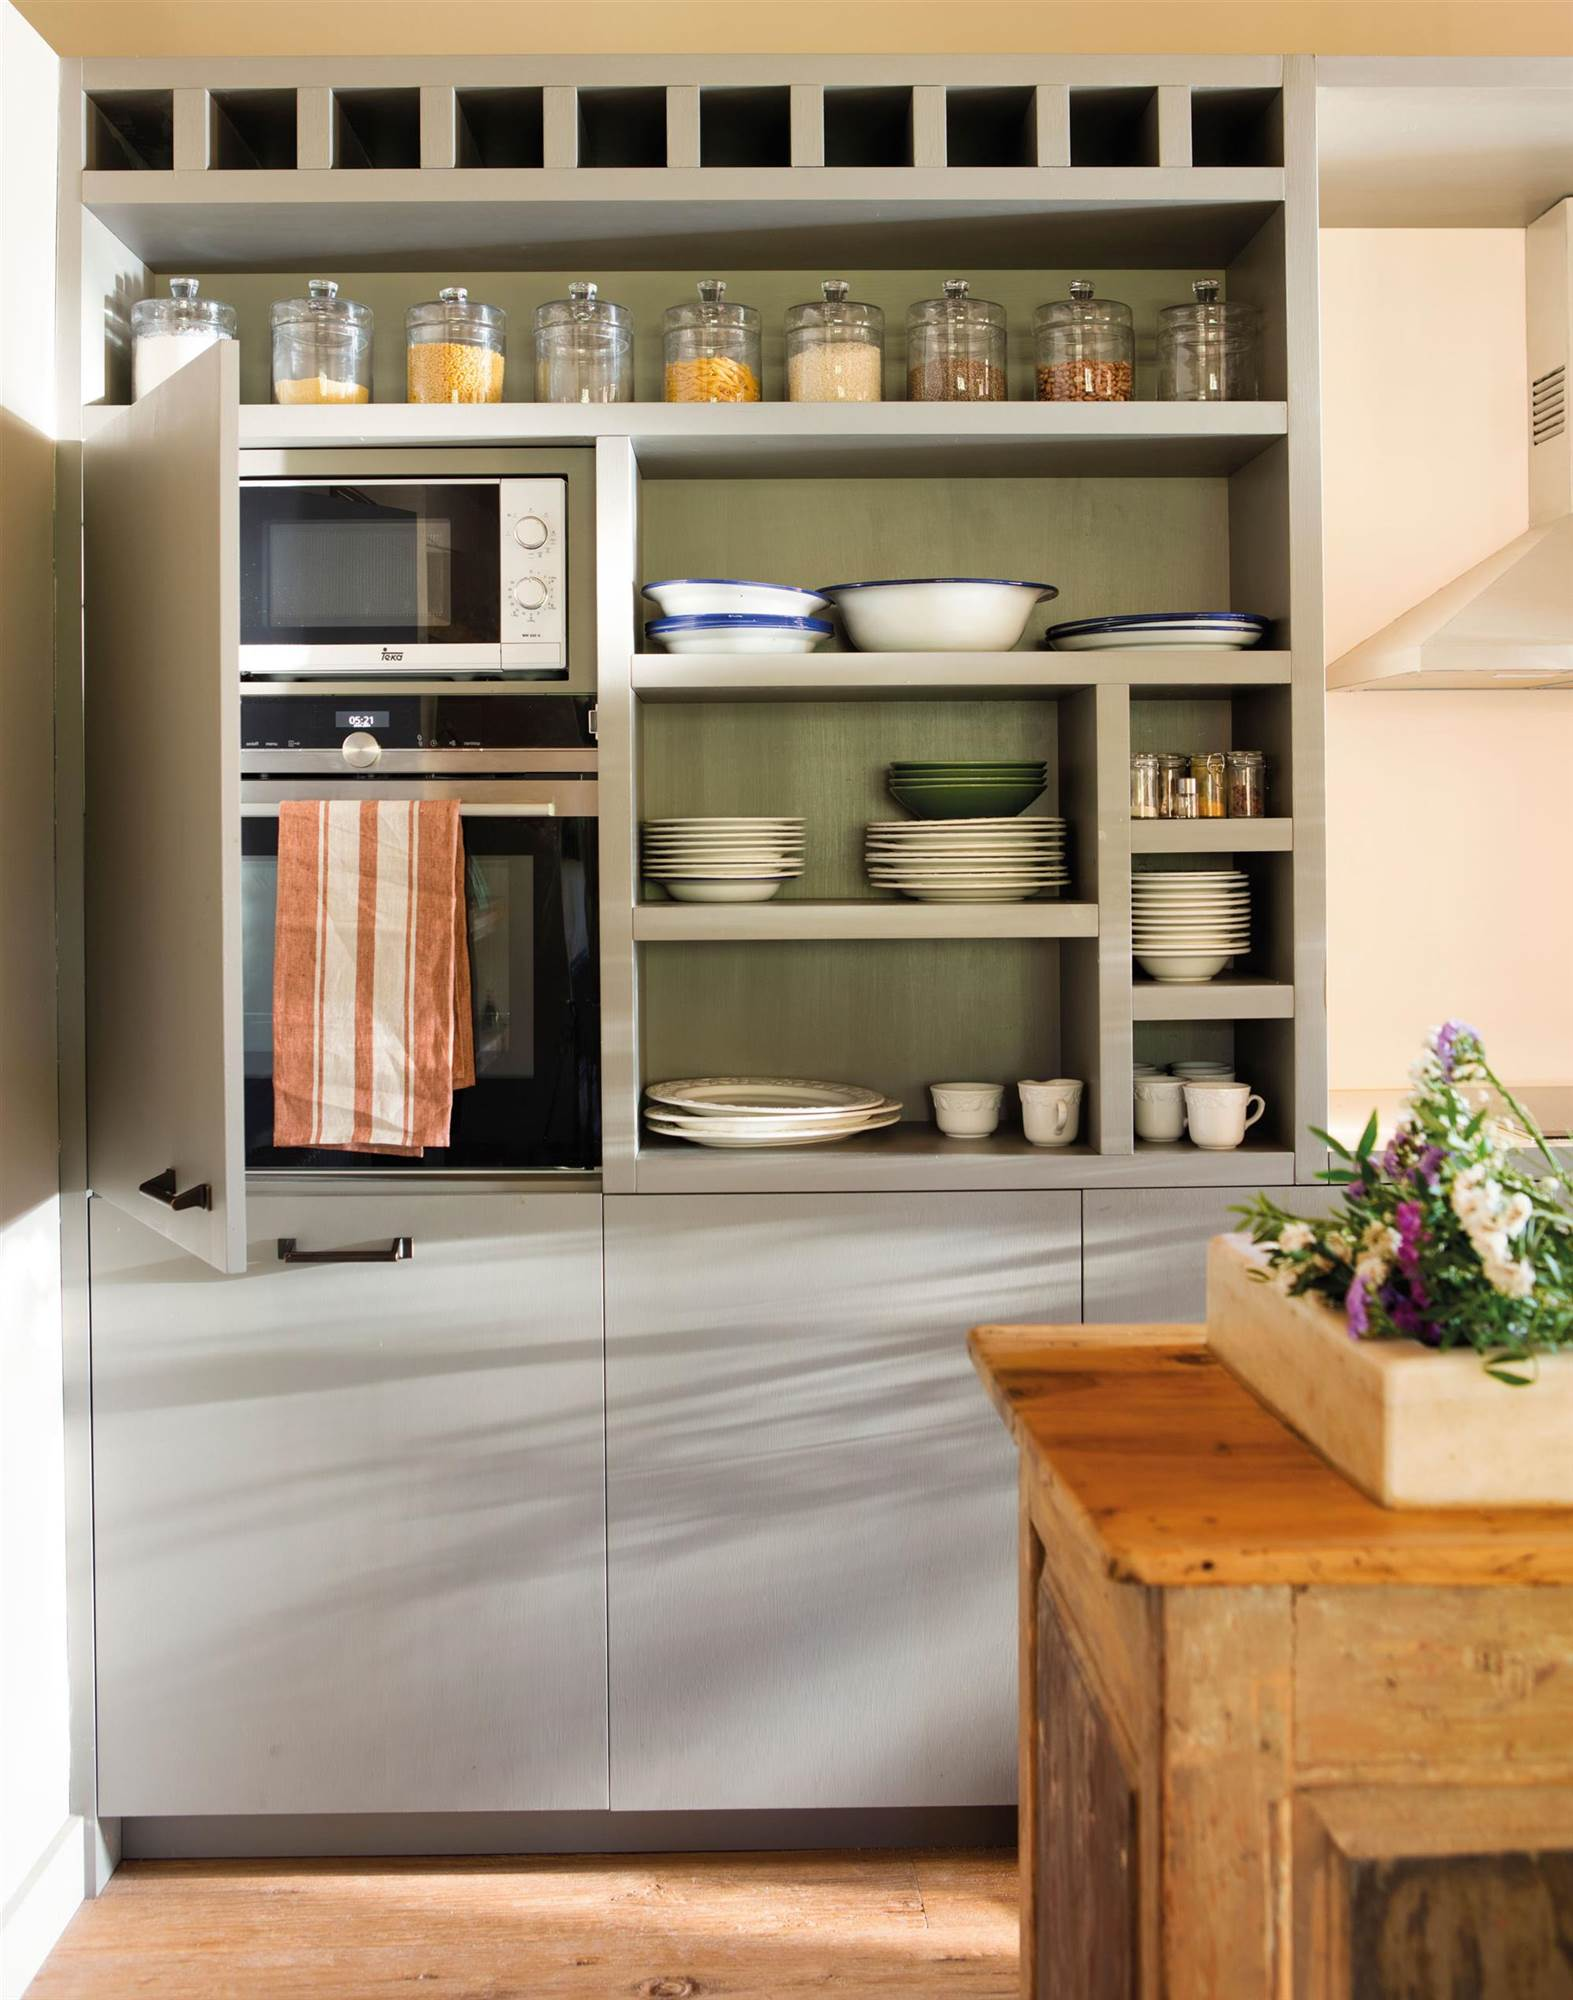 Panelar electrodom sticos for Muebles de cocina para microondas